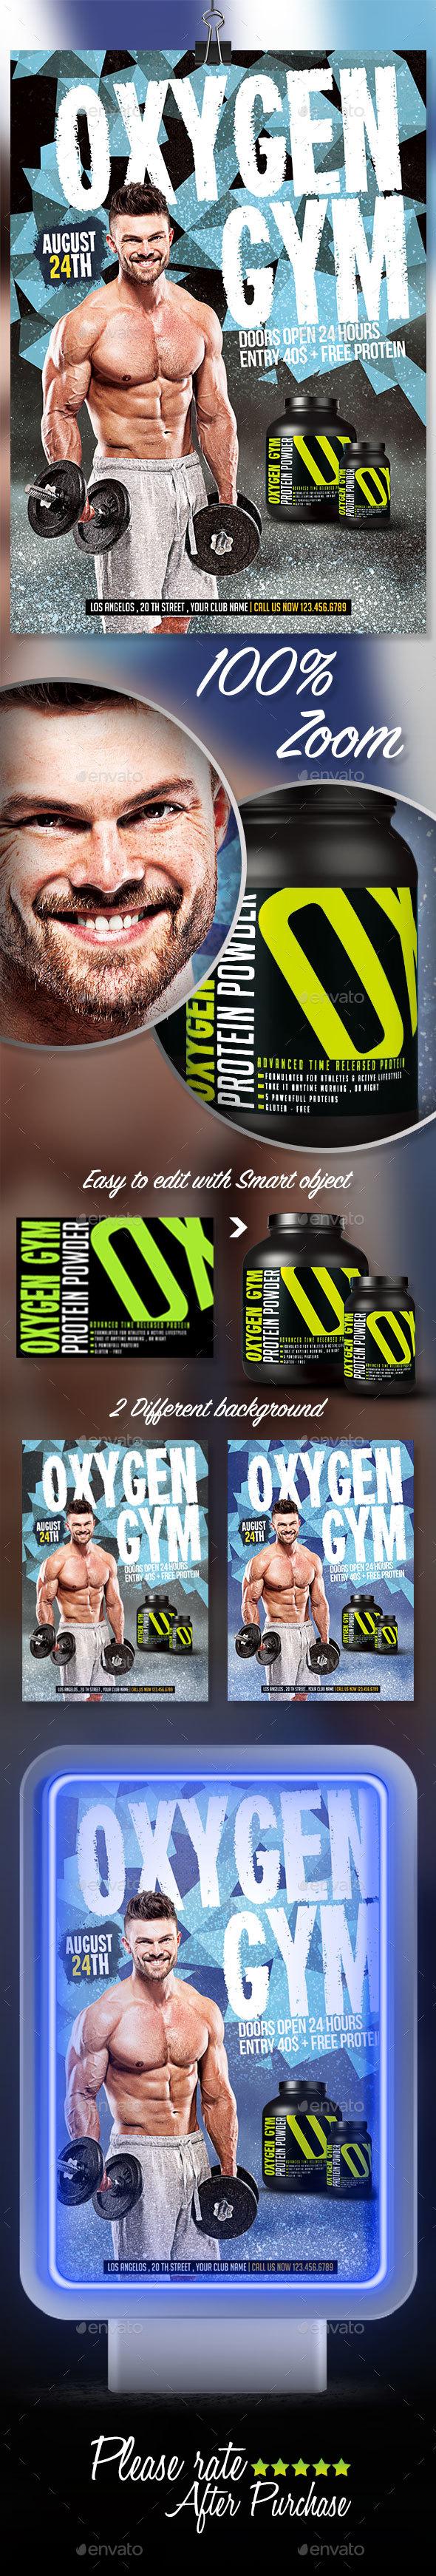 Oxygen Gym Flyer